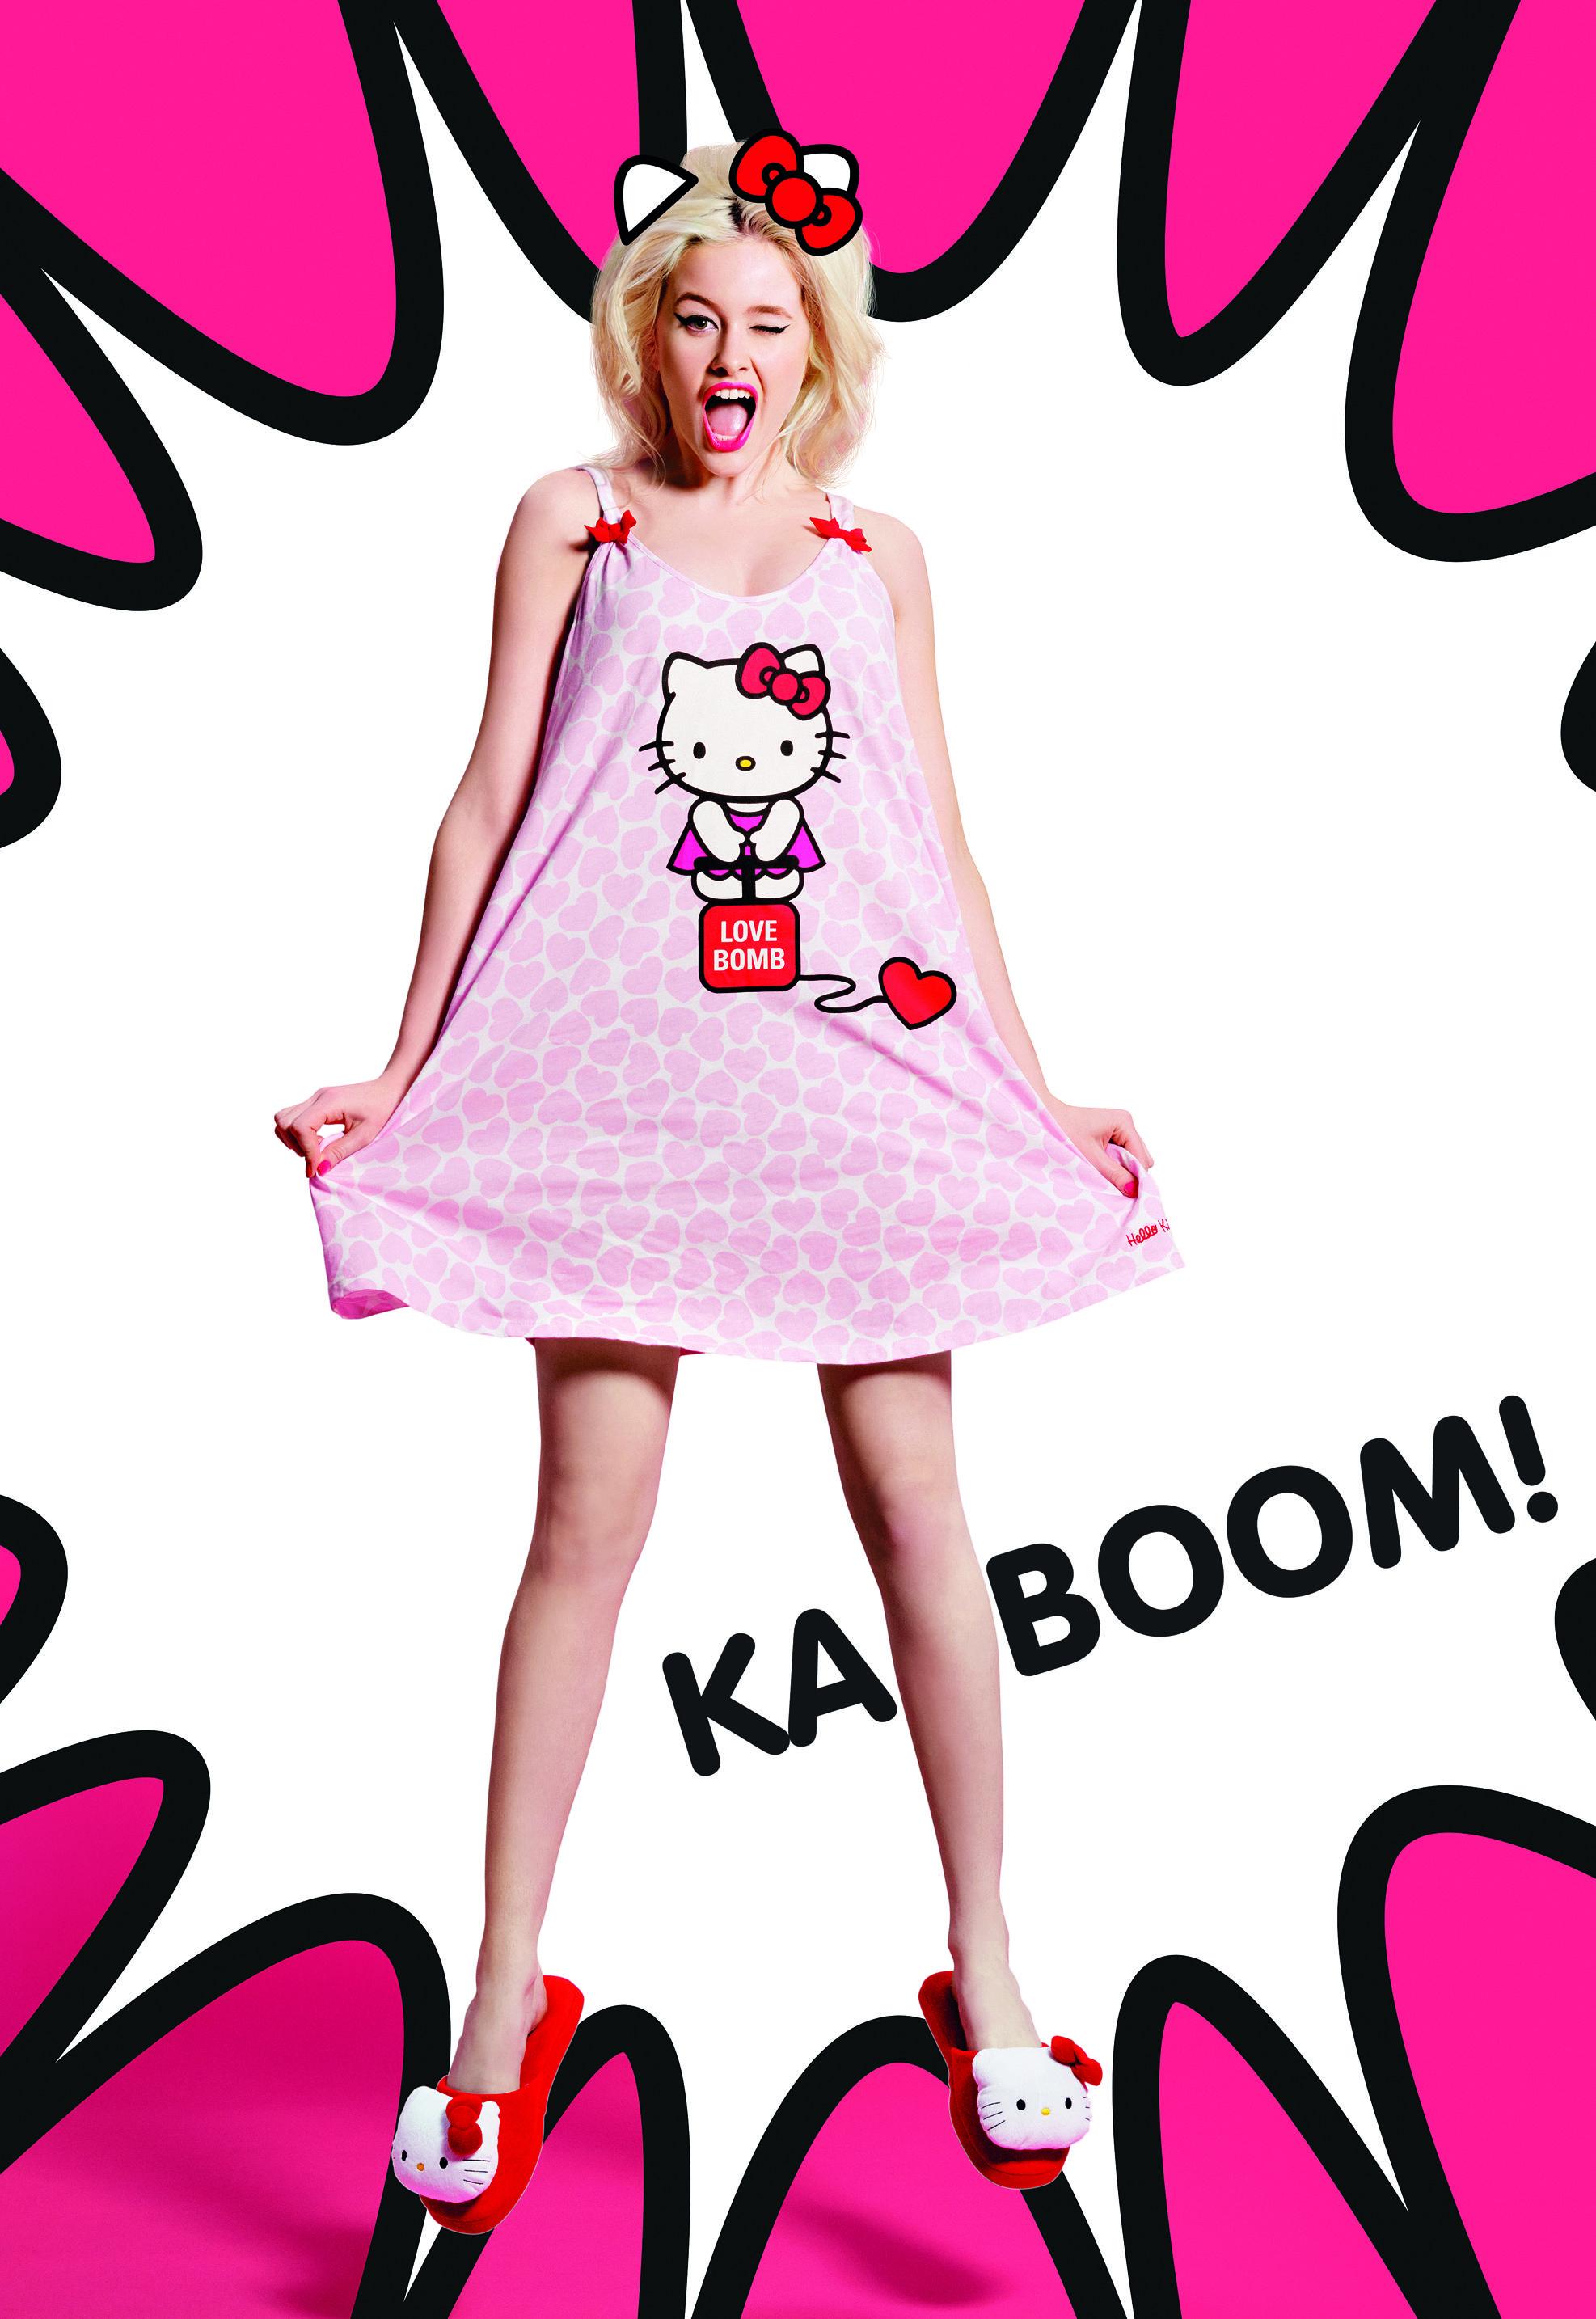 Kitty Love Bomb Nightie